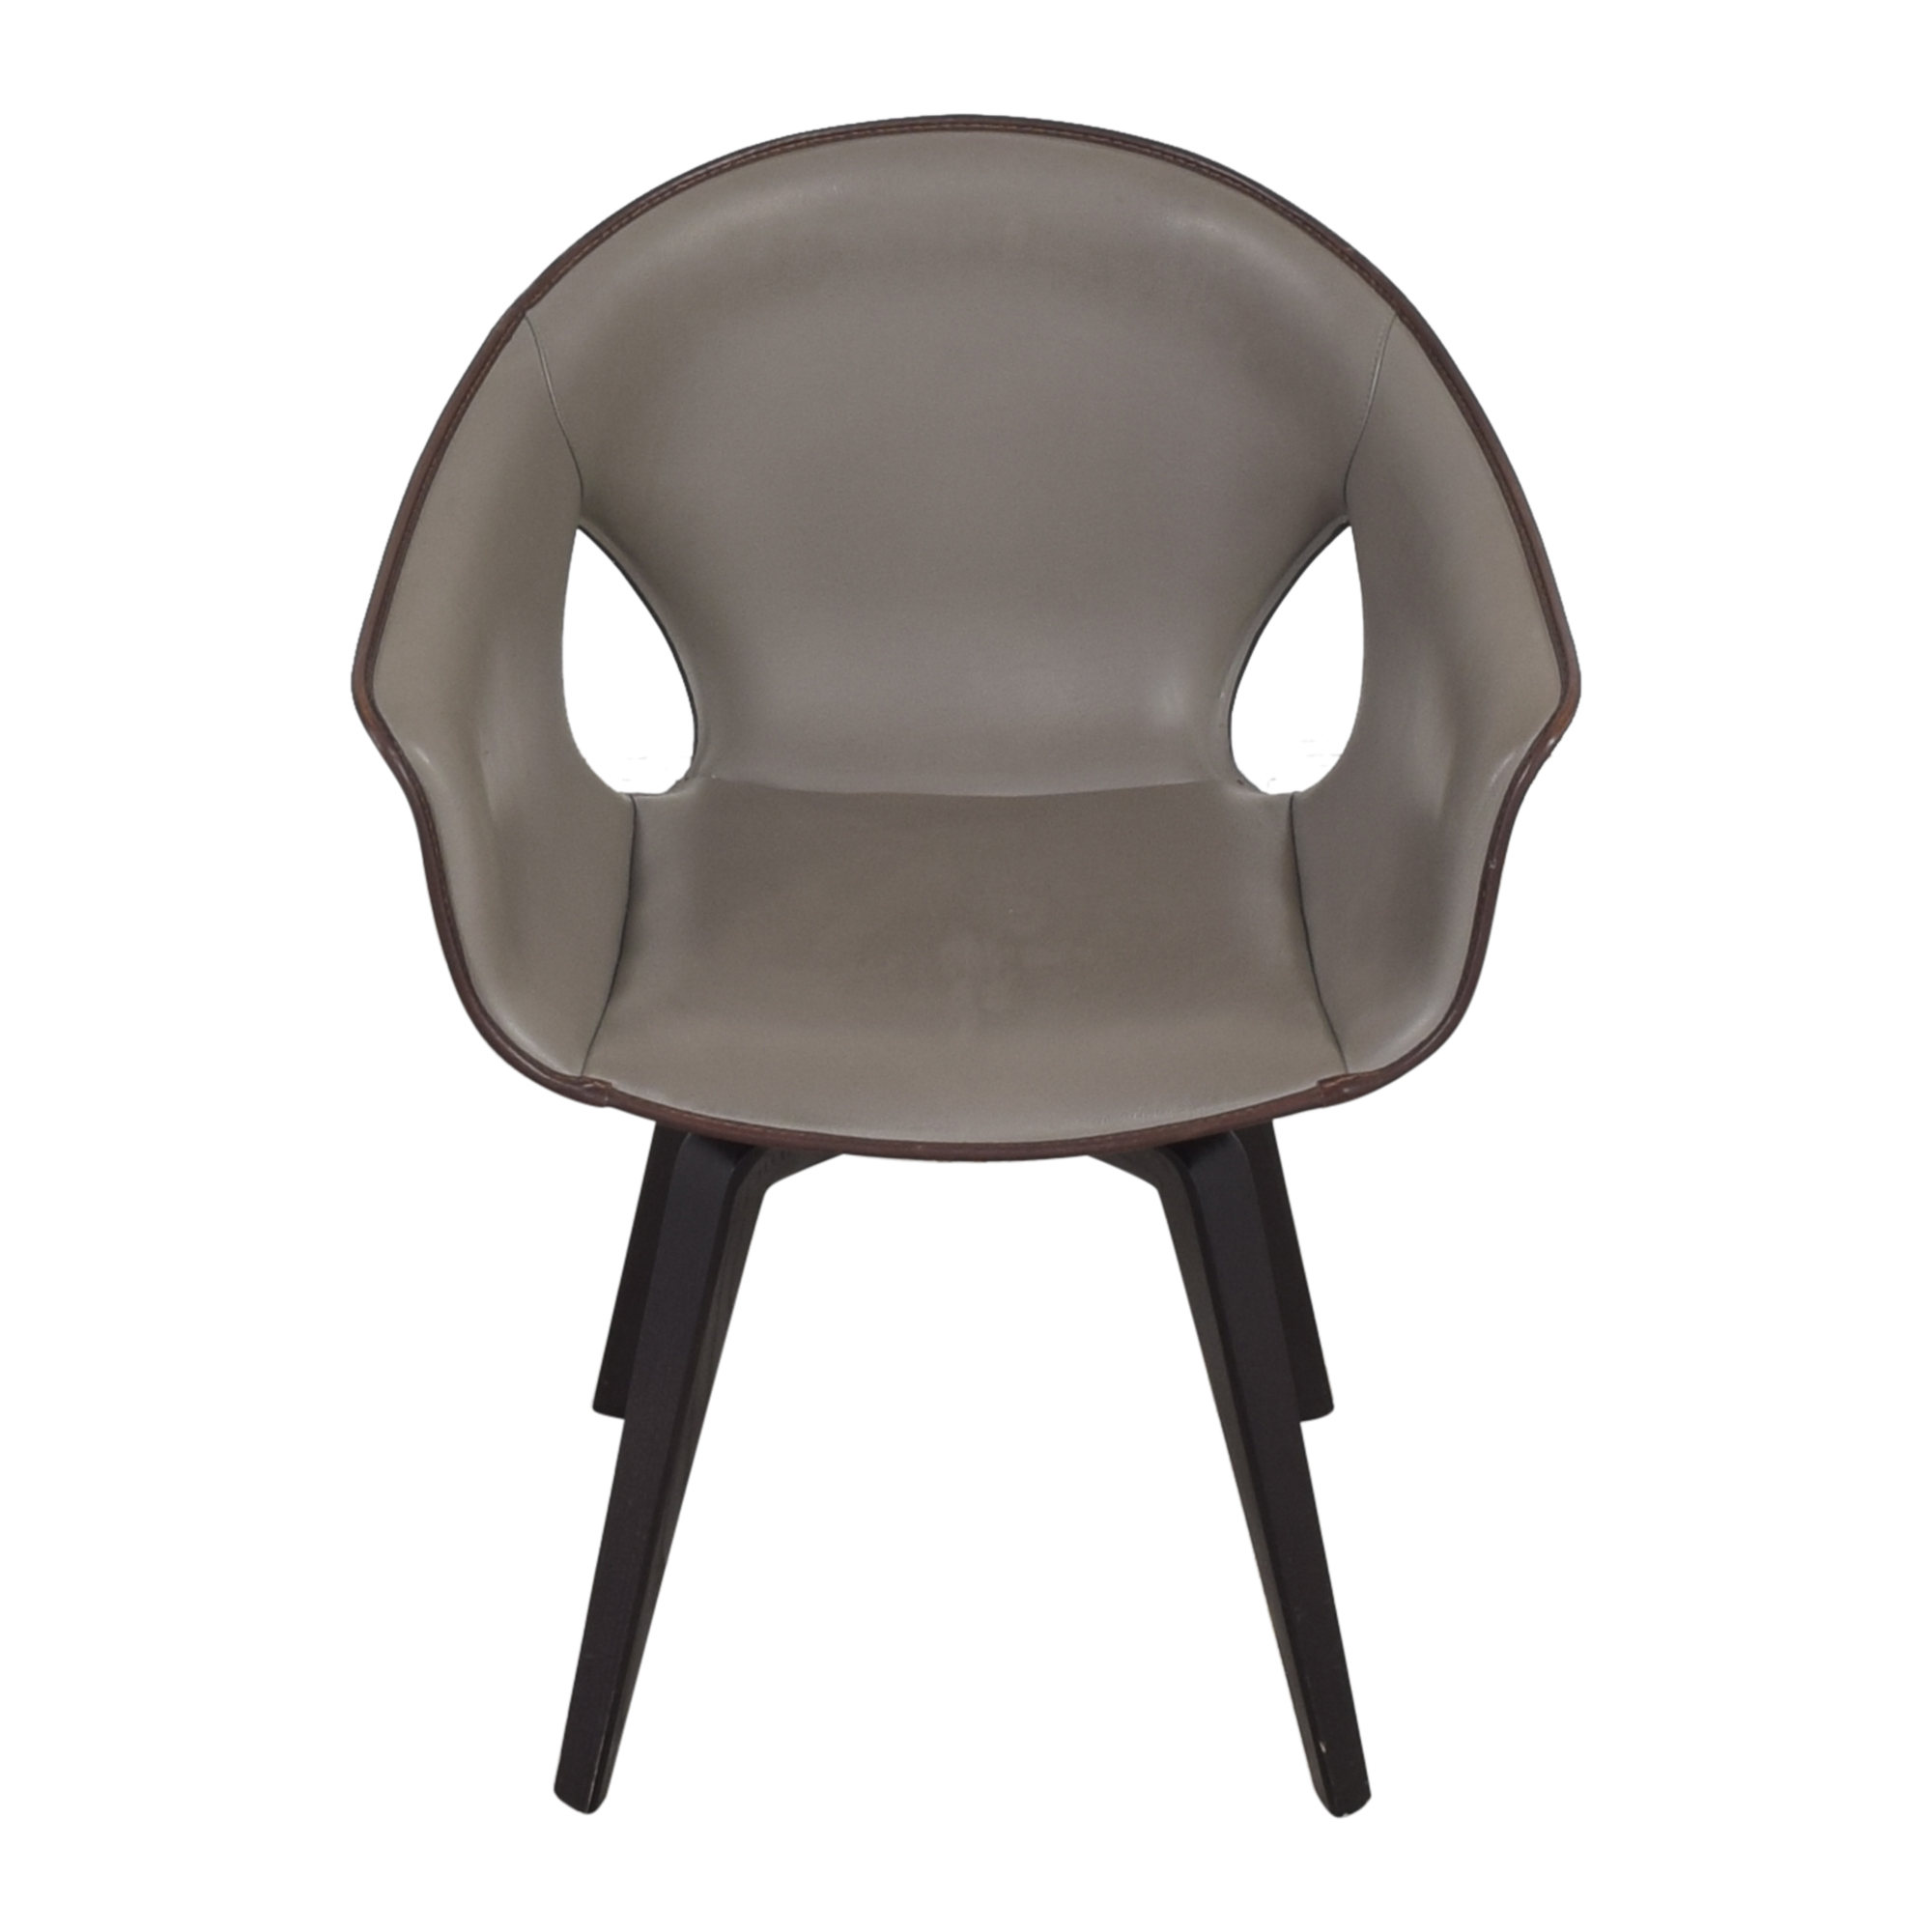 Poltrona Frau Poltrona Frau Ginger Side Chair nyc